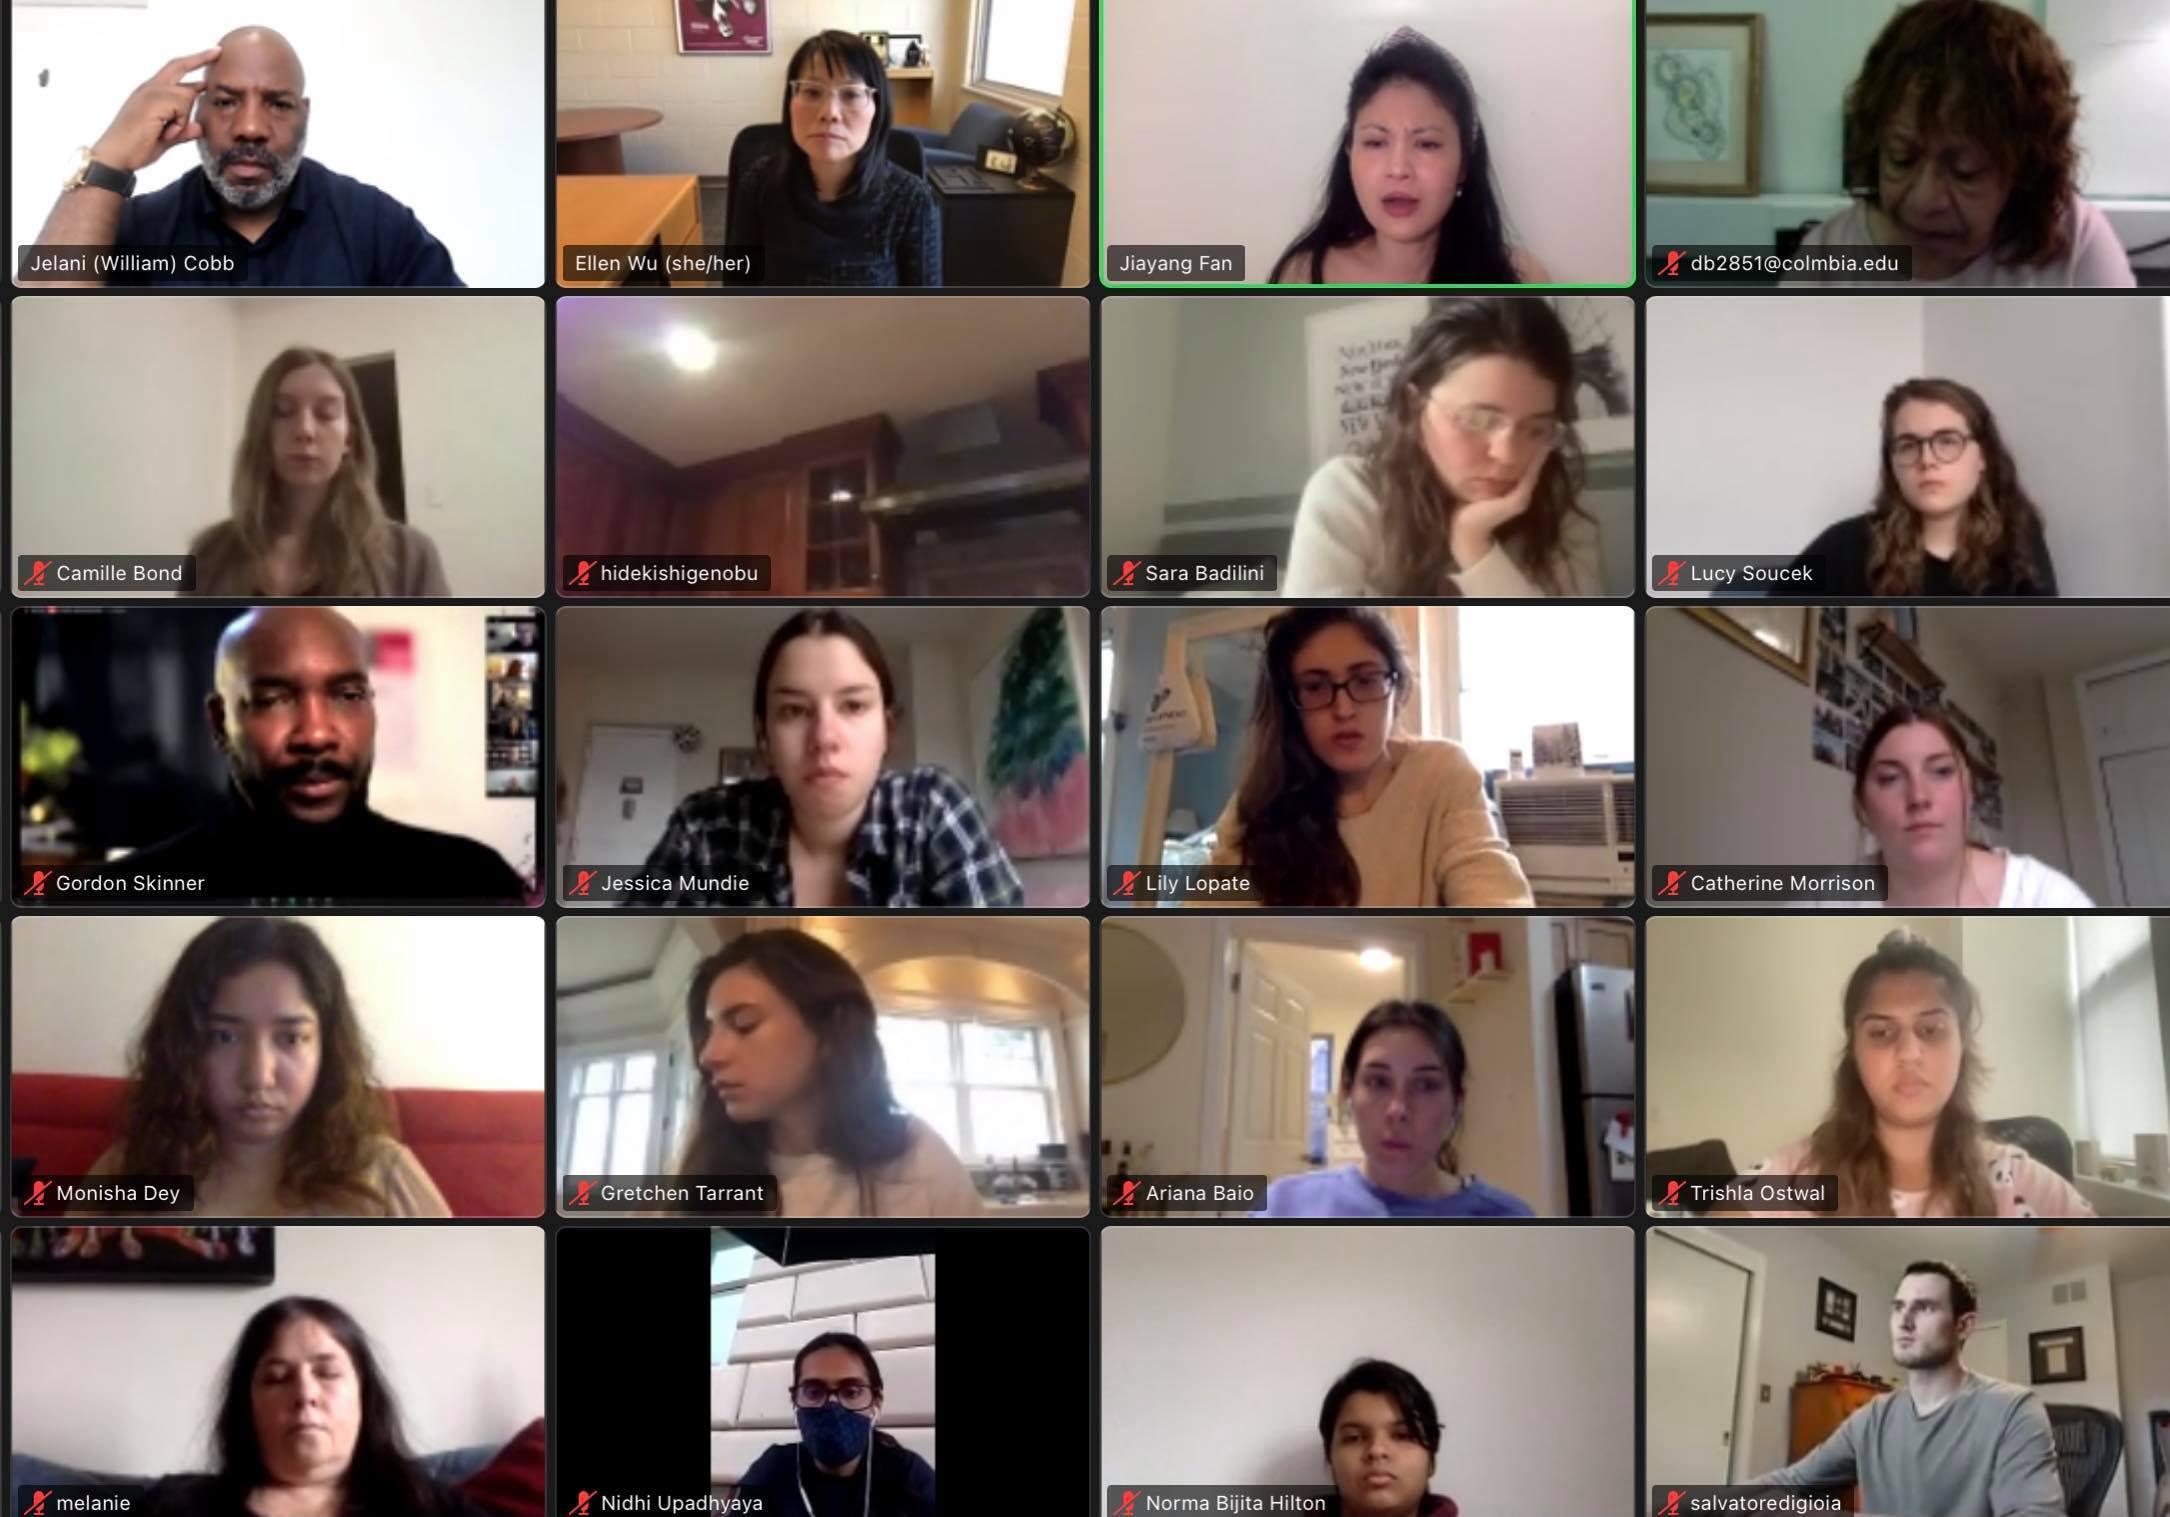 www.columbiaspectator.com: Recap: Columbia's conversation on violence against Asian Americans